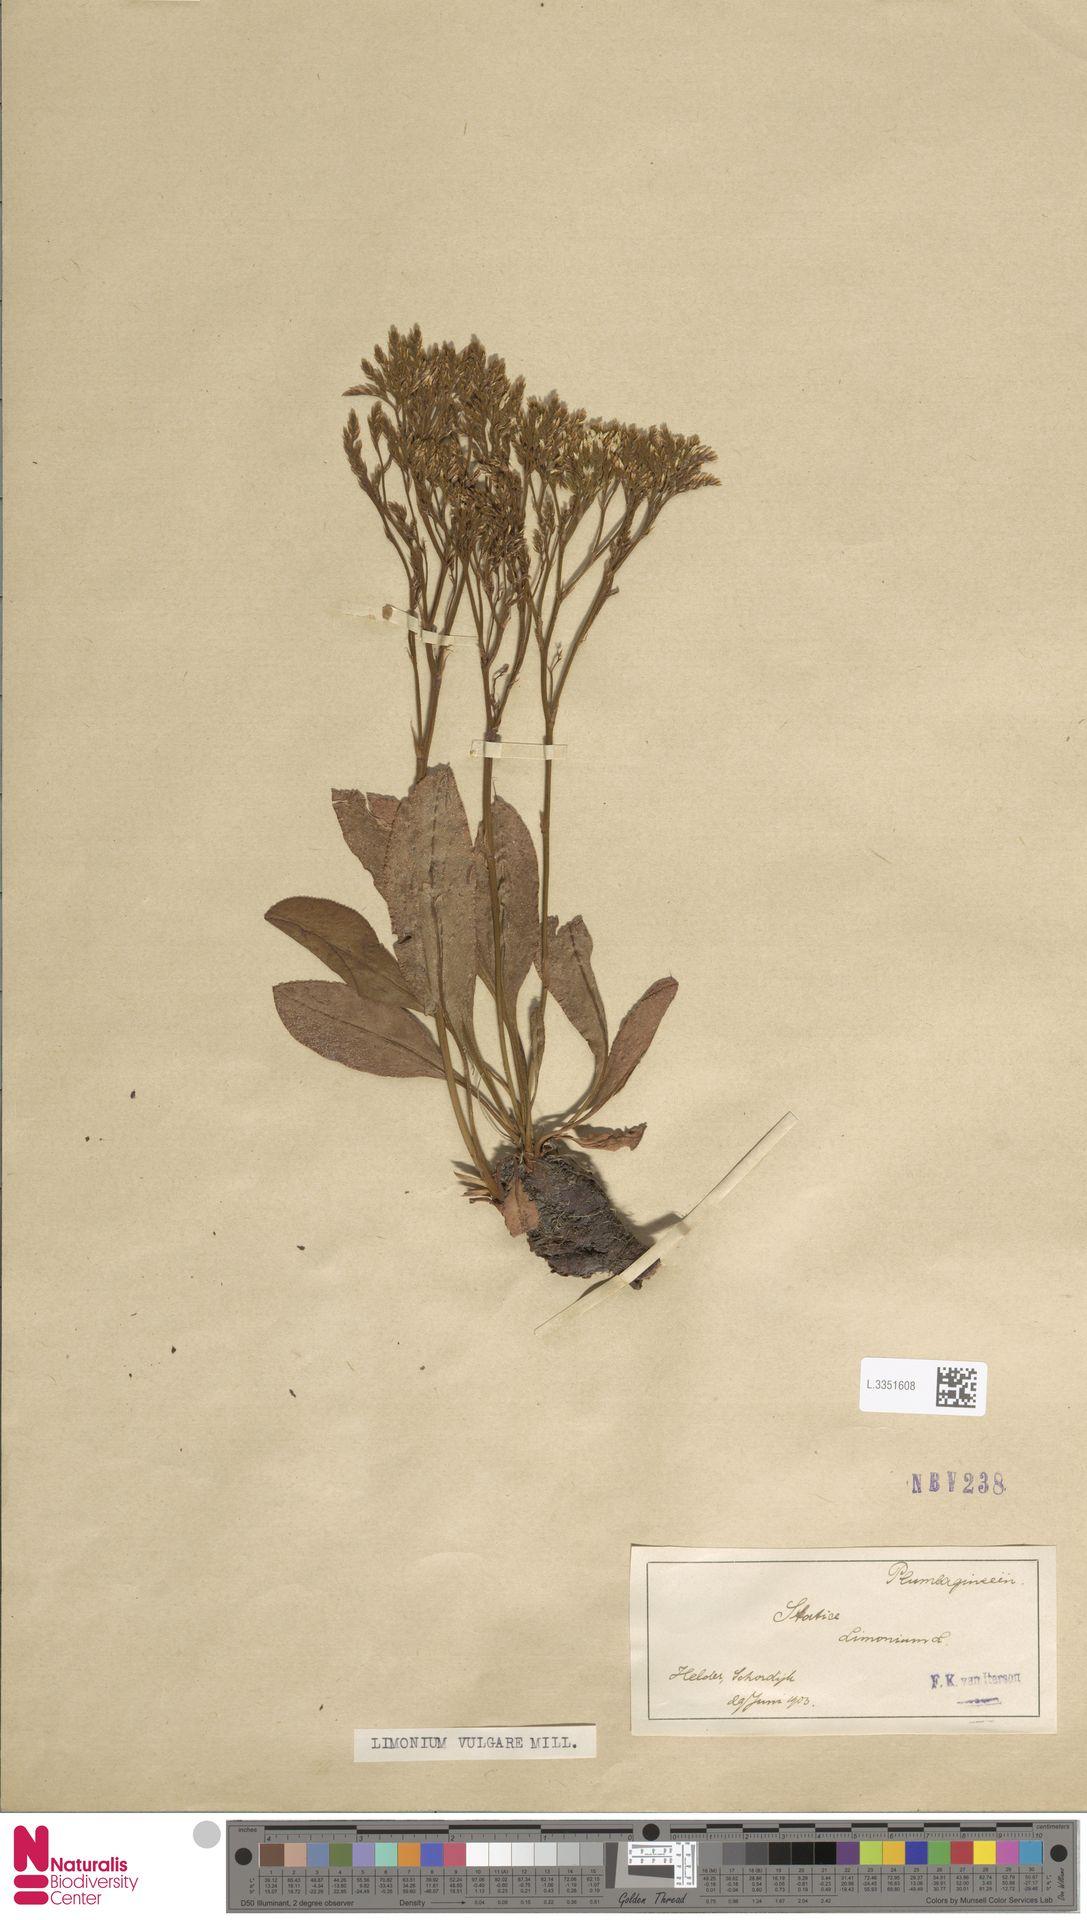 L.3351608 | Limonium vulgare Mill.